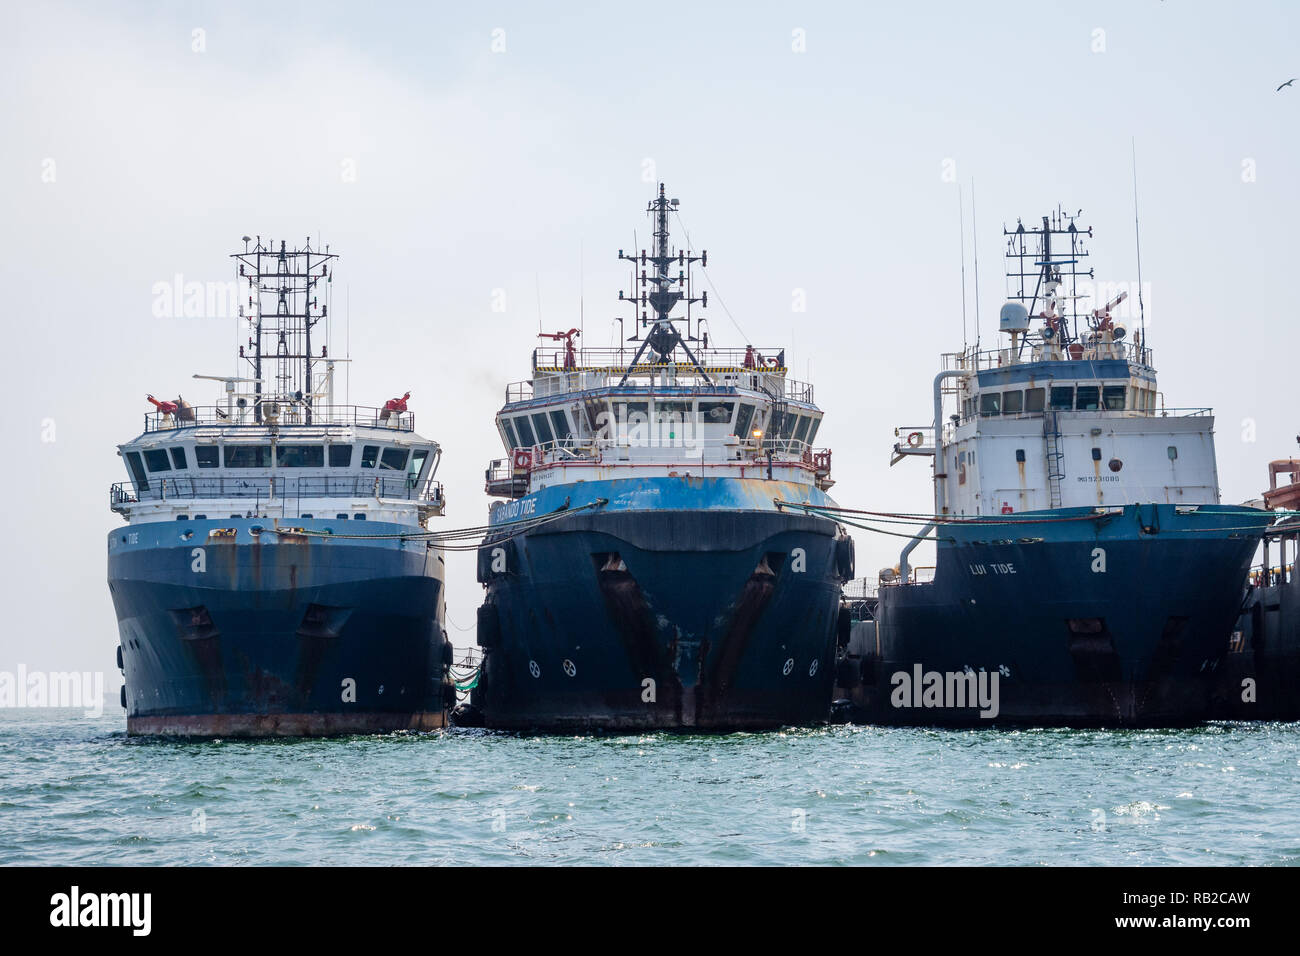 cargo ships moored, Walvis Bay, Namibia - Stock Image